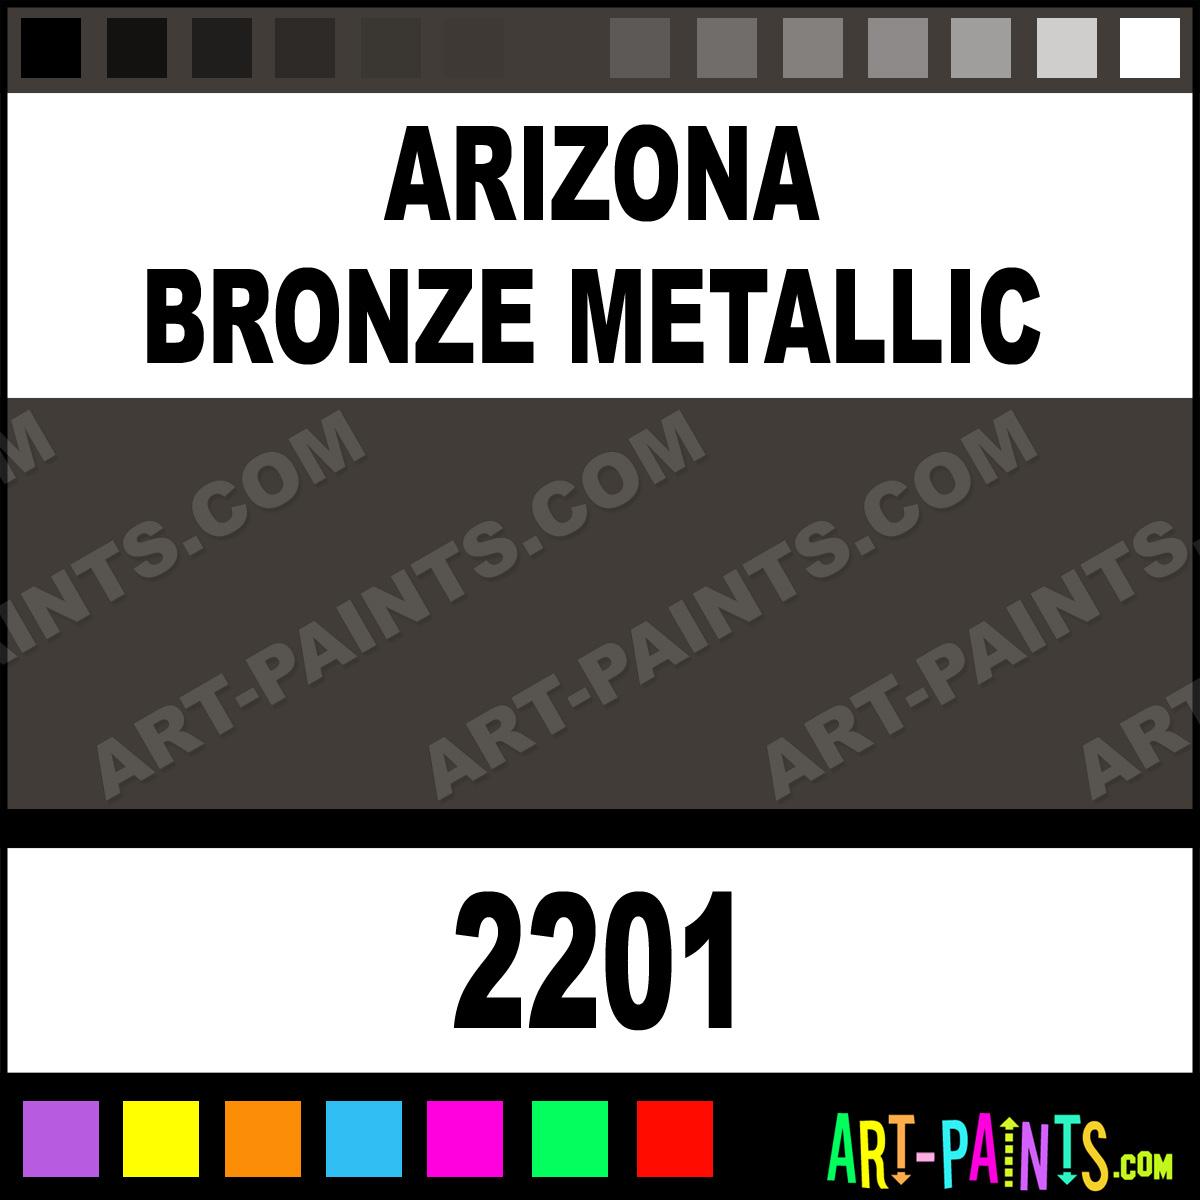 Arizona Bronze Metallic Acrylic Enamel Paints - 2201 - Arizona Bronze Metallic Paint. Arizona Bronze Metallic Color. AE Acrylic Paint. 403B37 ...